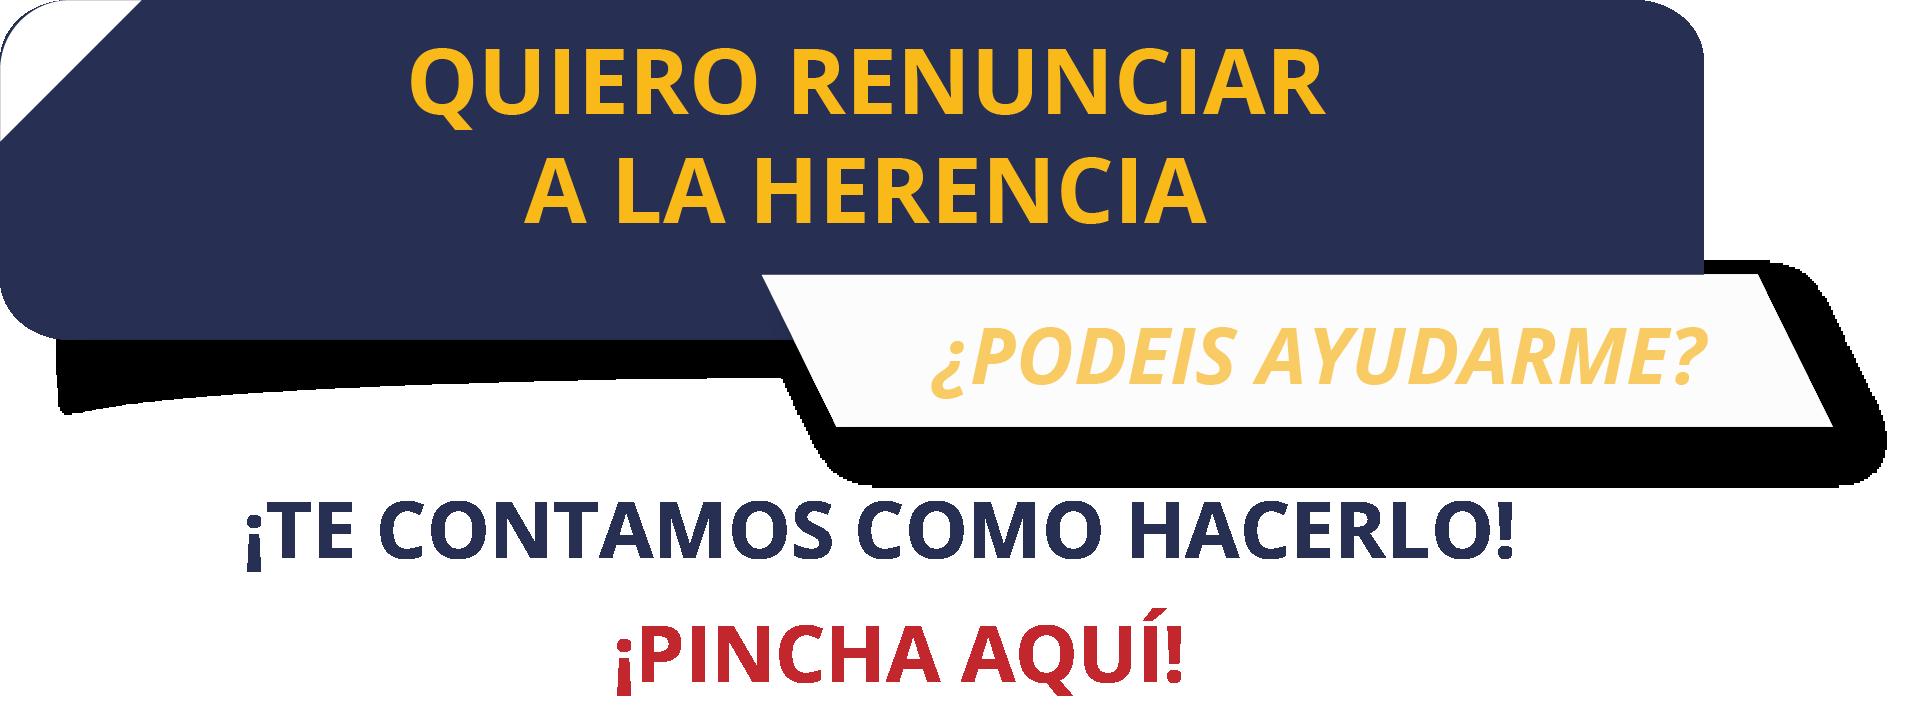 RENUNCIA A LA HERENCIA